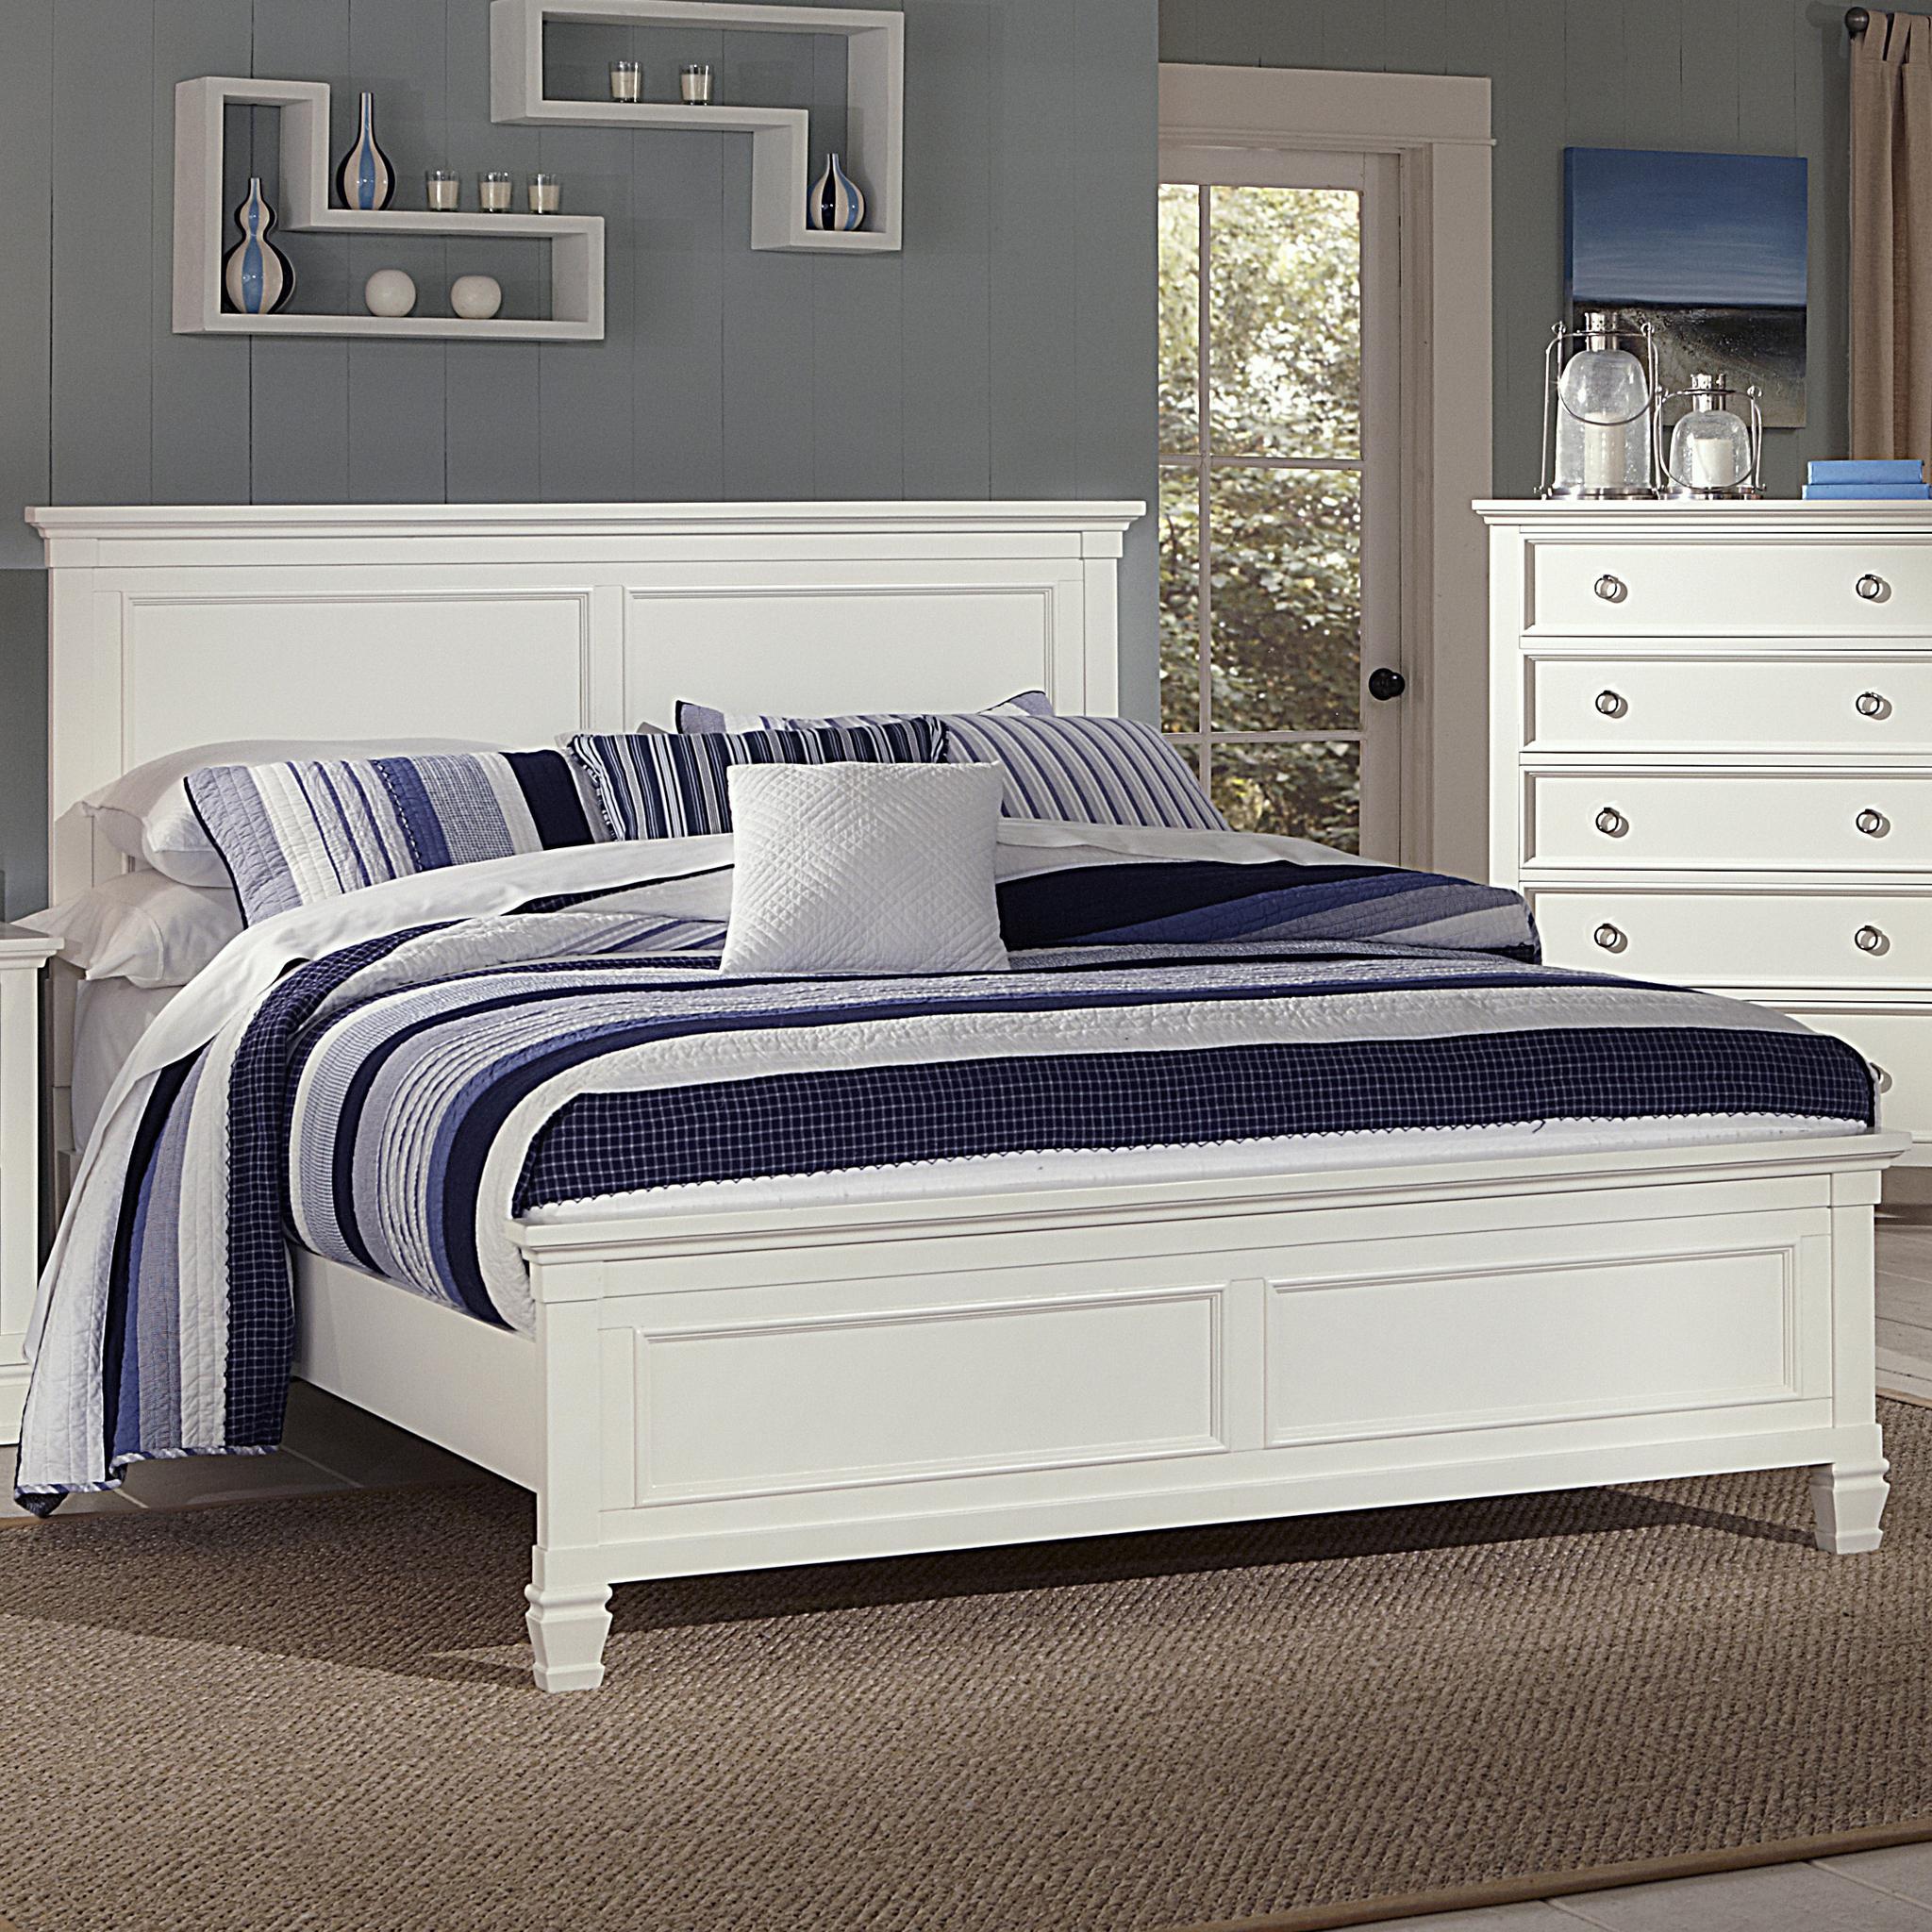 New Classic Tamarack California King Panel Bed - Item Number: 00-044-215+235